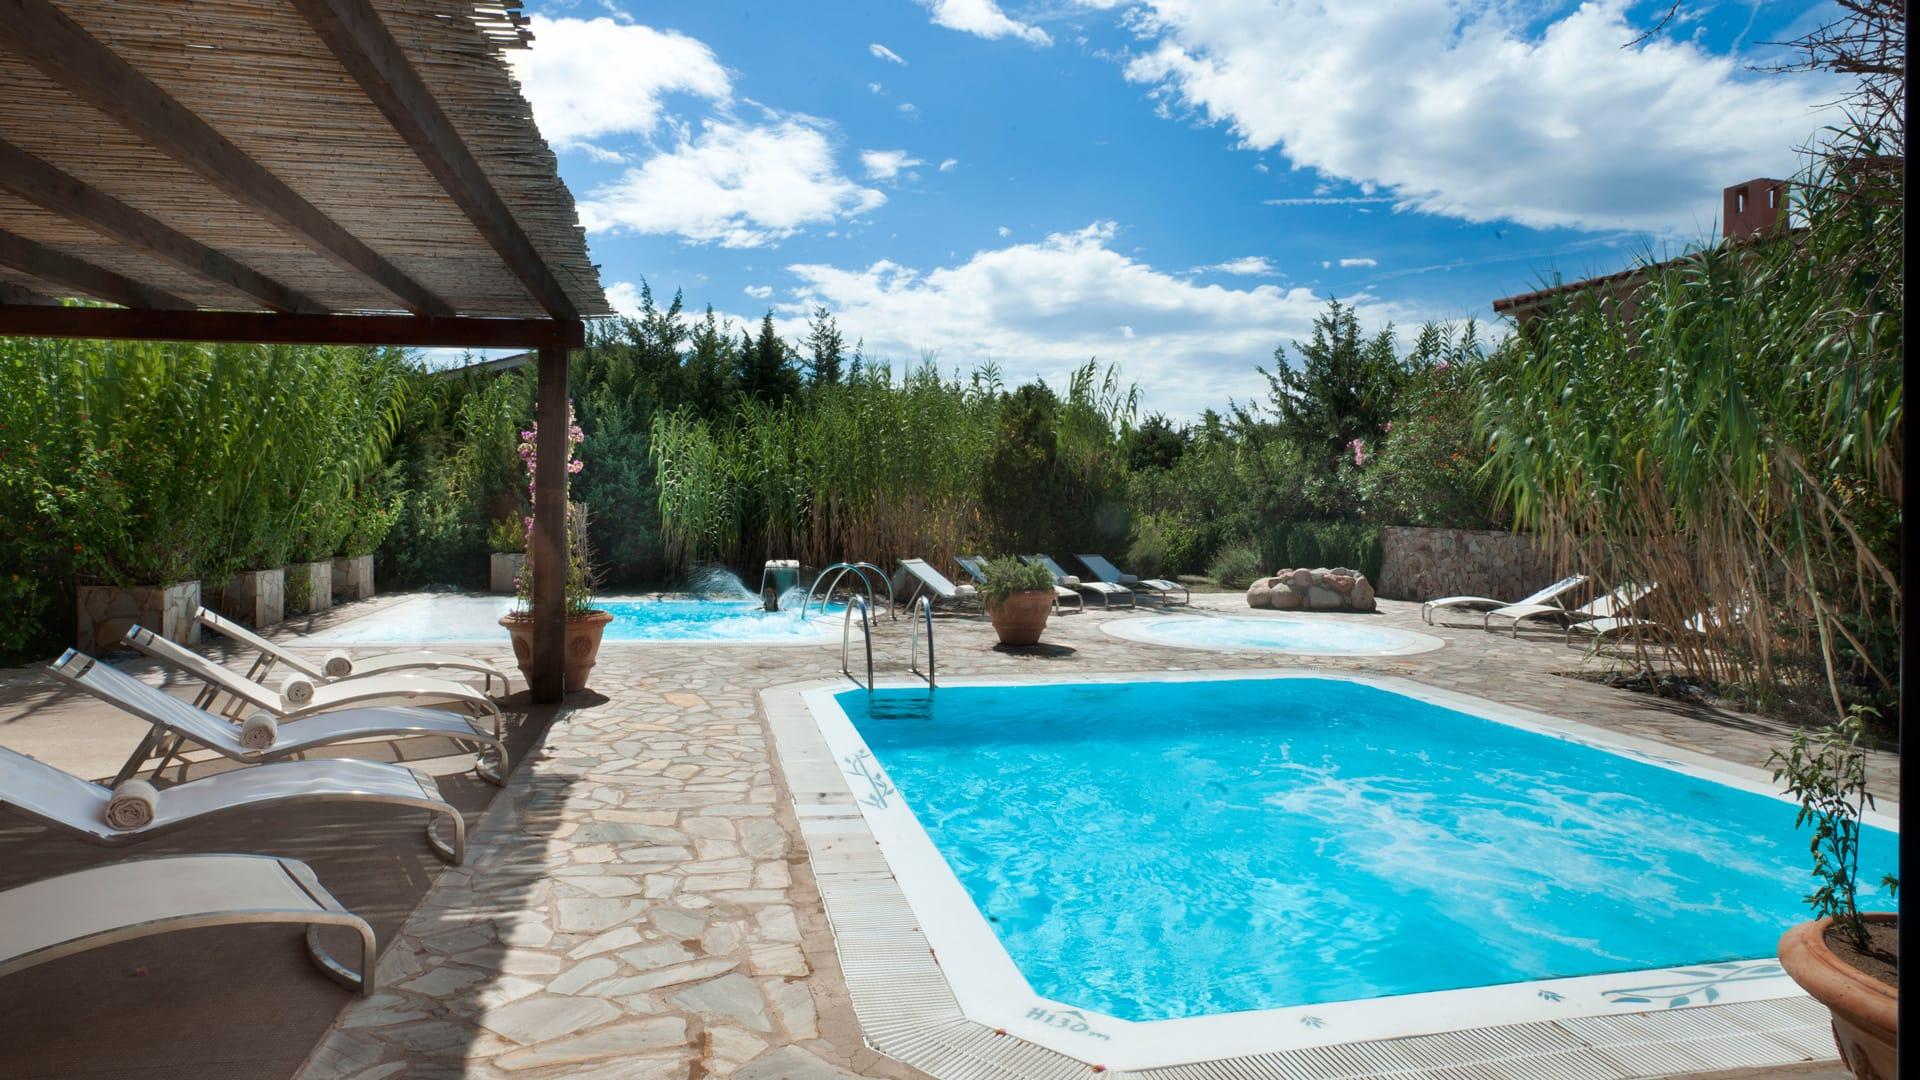 Piscines Es & Spas le sabine spa wellness centre in sardinia at resort & spa le